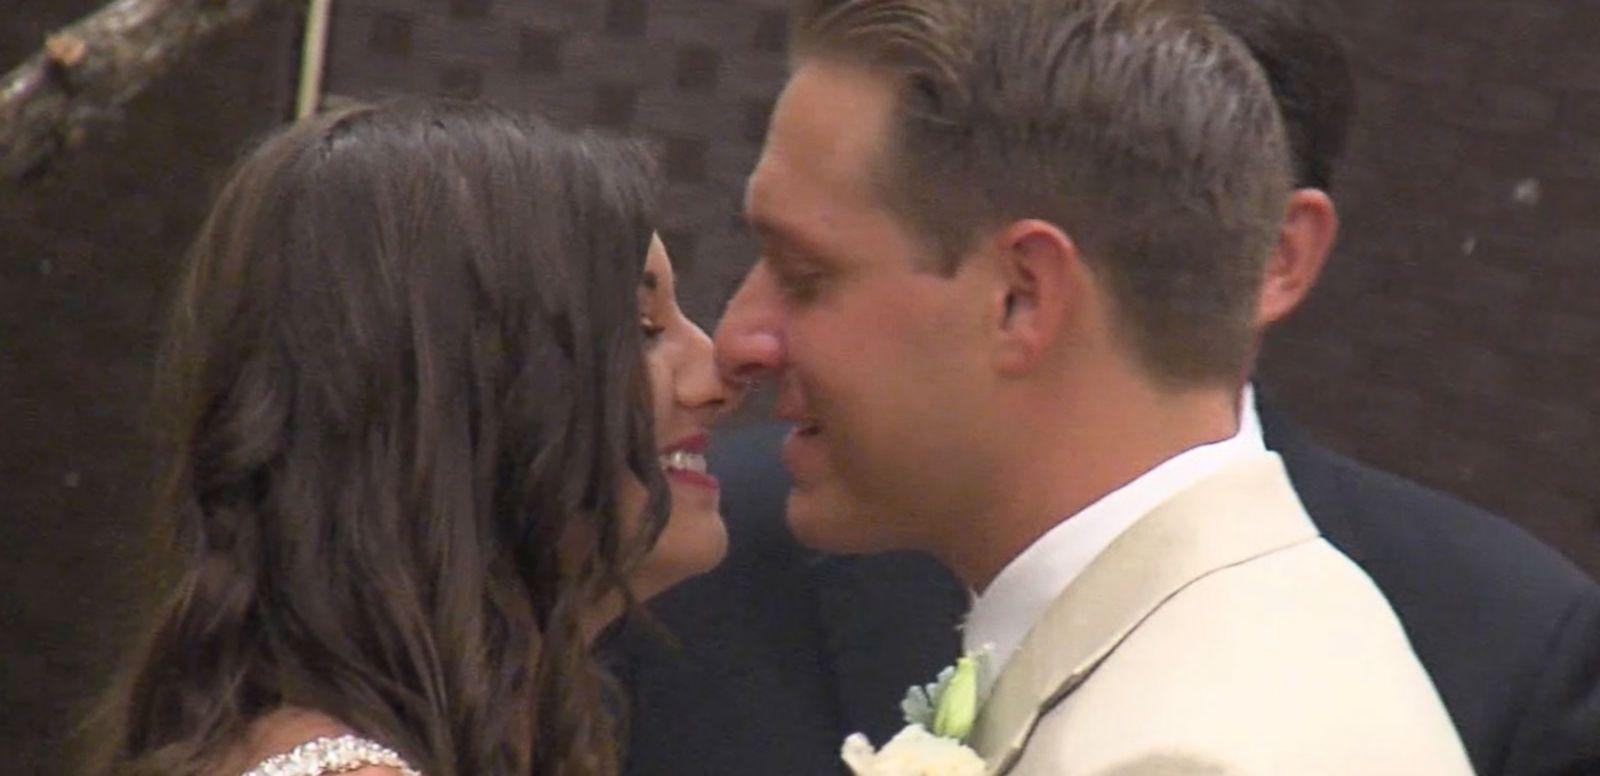 VIDEO: Couple Gets Married Amid Major South Carolina Storm